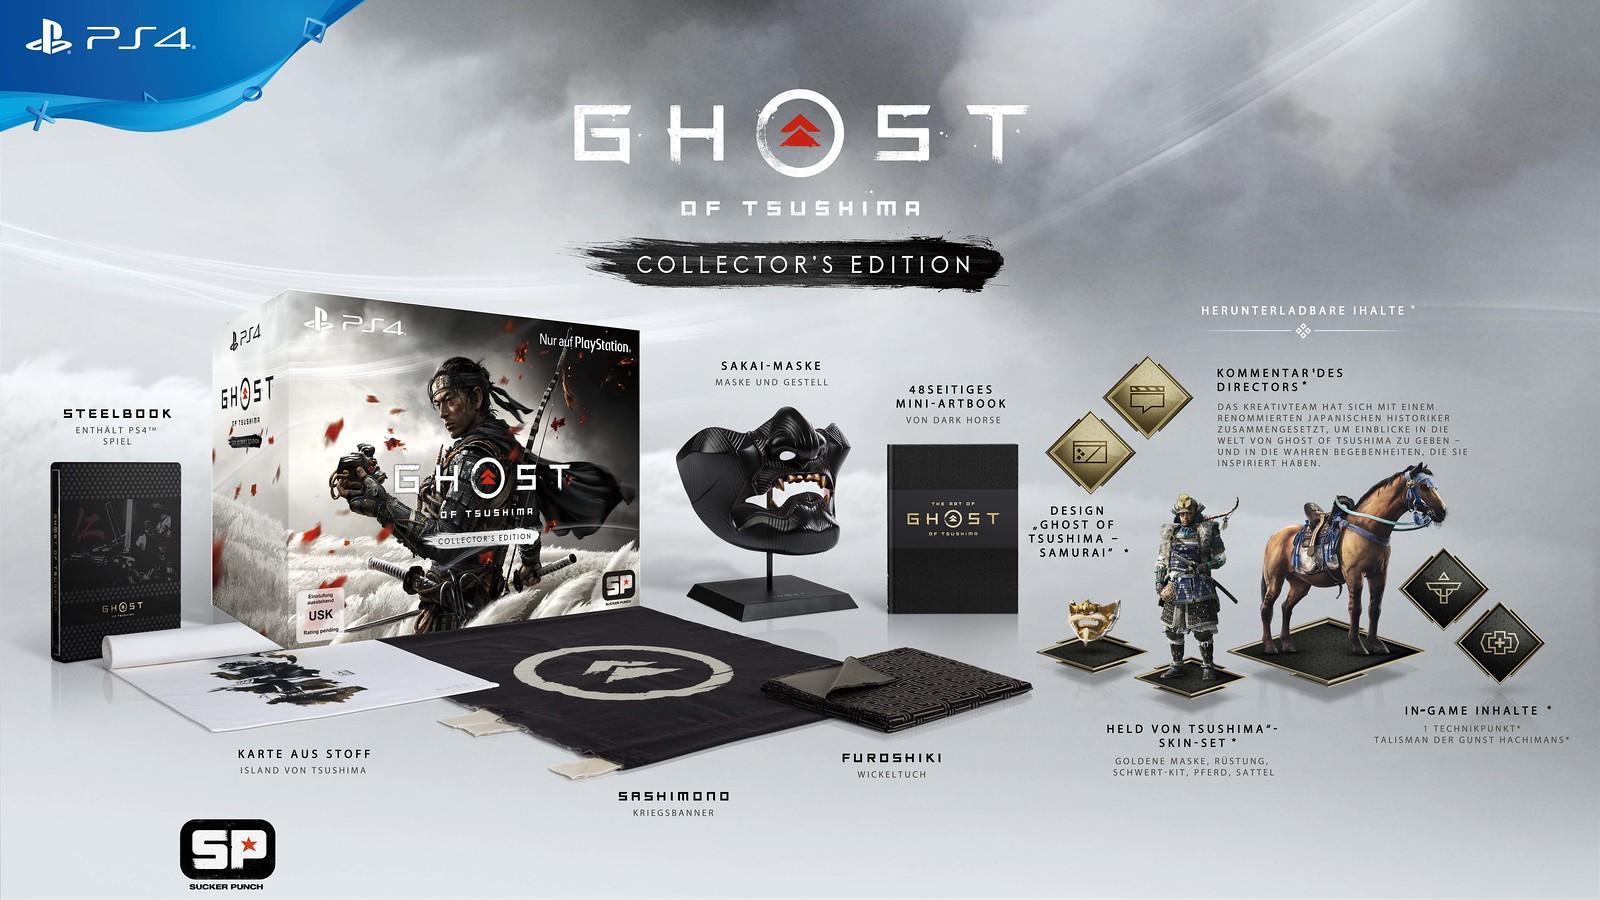 49622740442 70f70a5474 h - Ghost of Tsushima erscheint am 26. Juni: Collector's & Digital Deluxe Edition im Detail